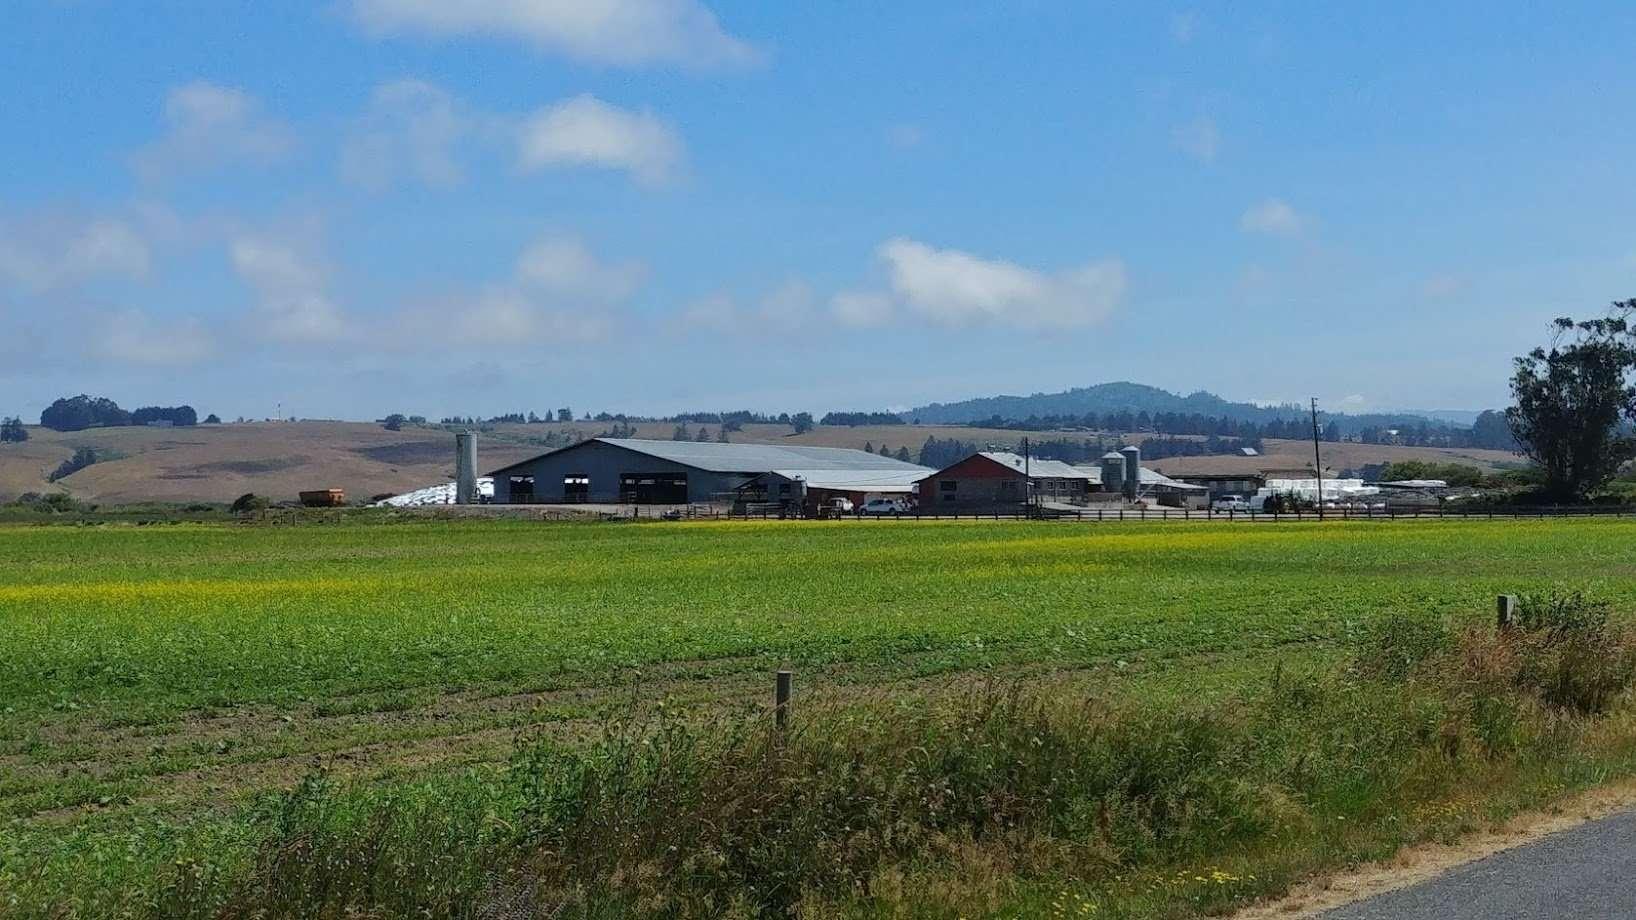 Organic O'Neil Dairy, Livestock & Land, Loleta, CA